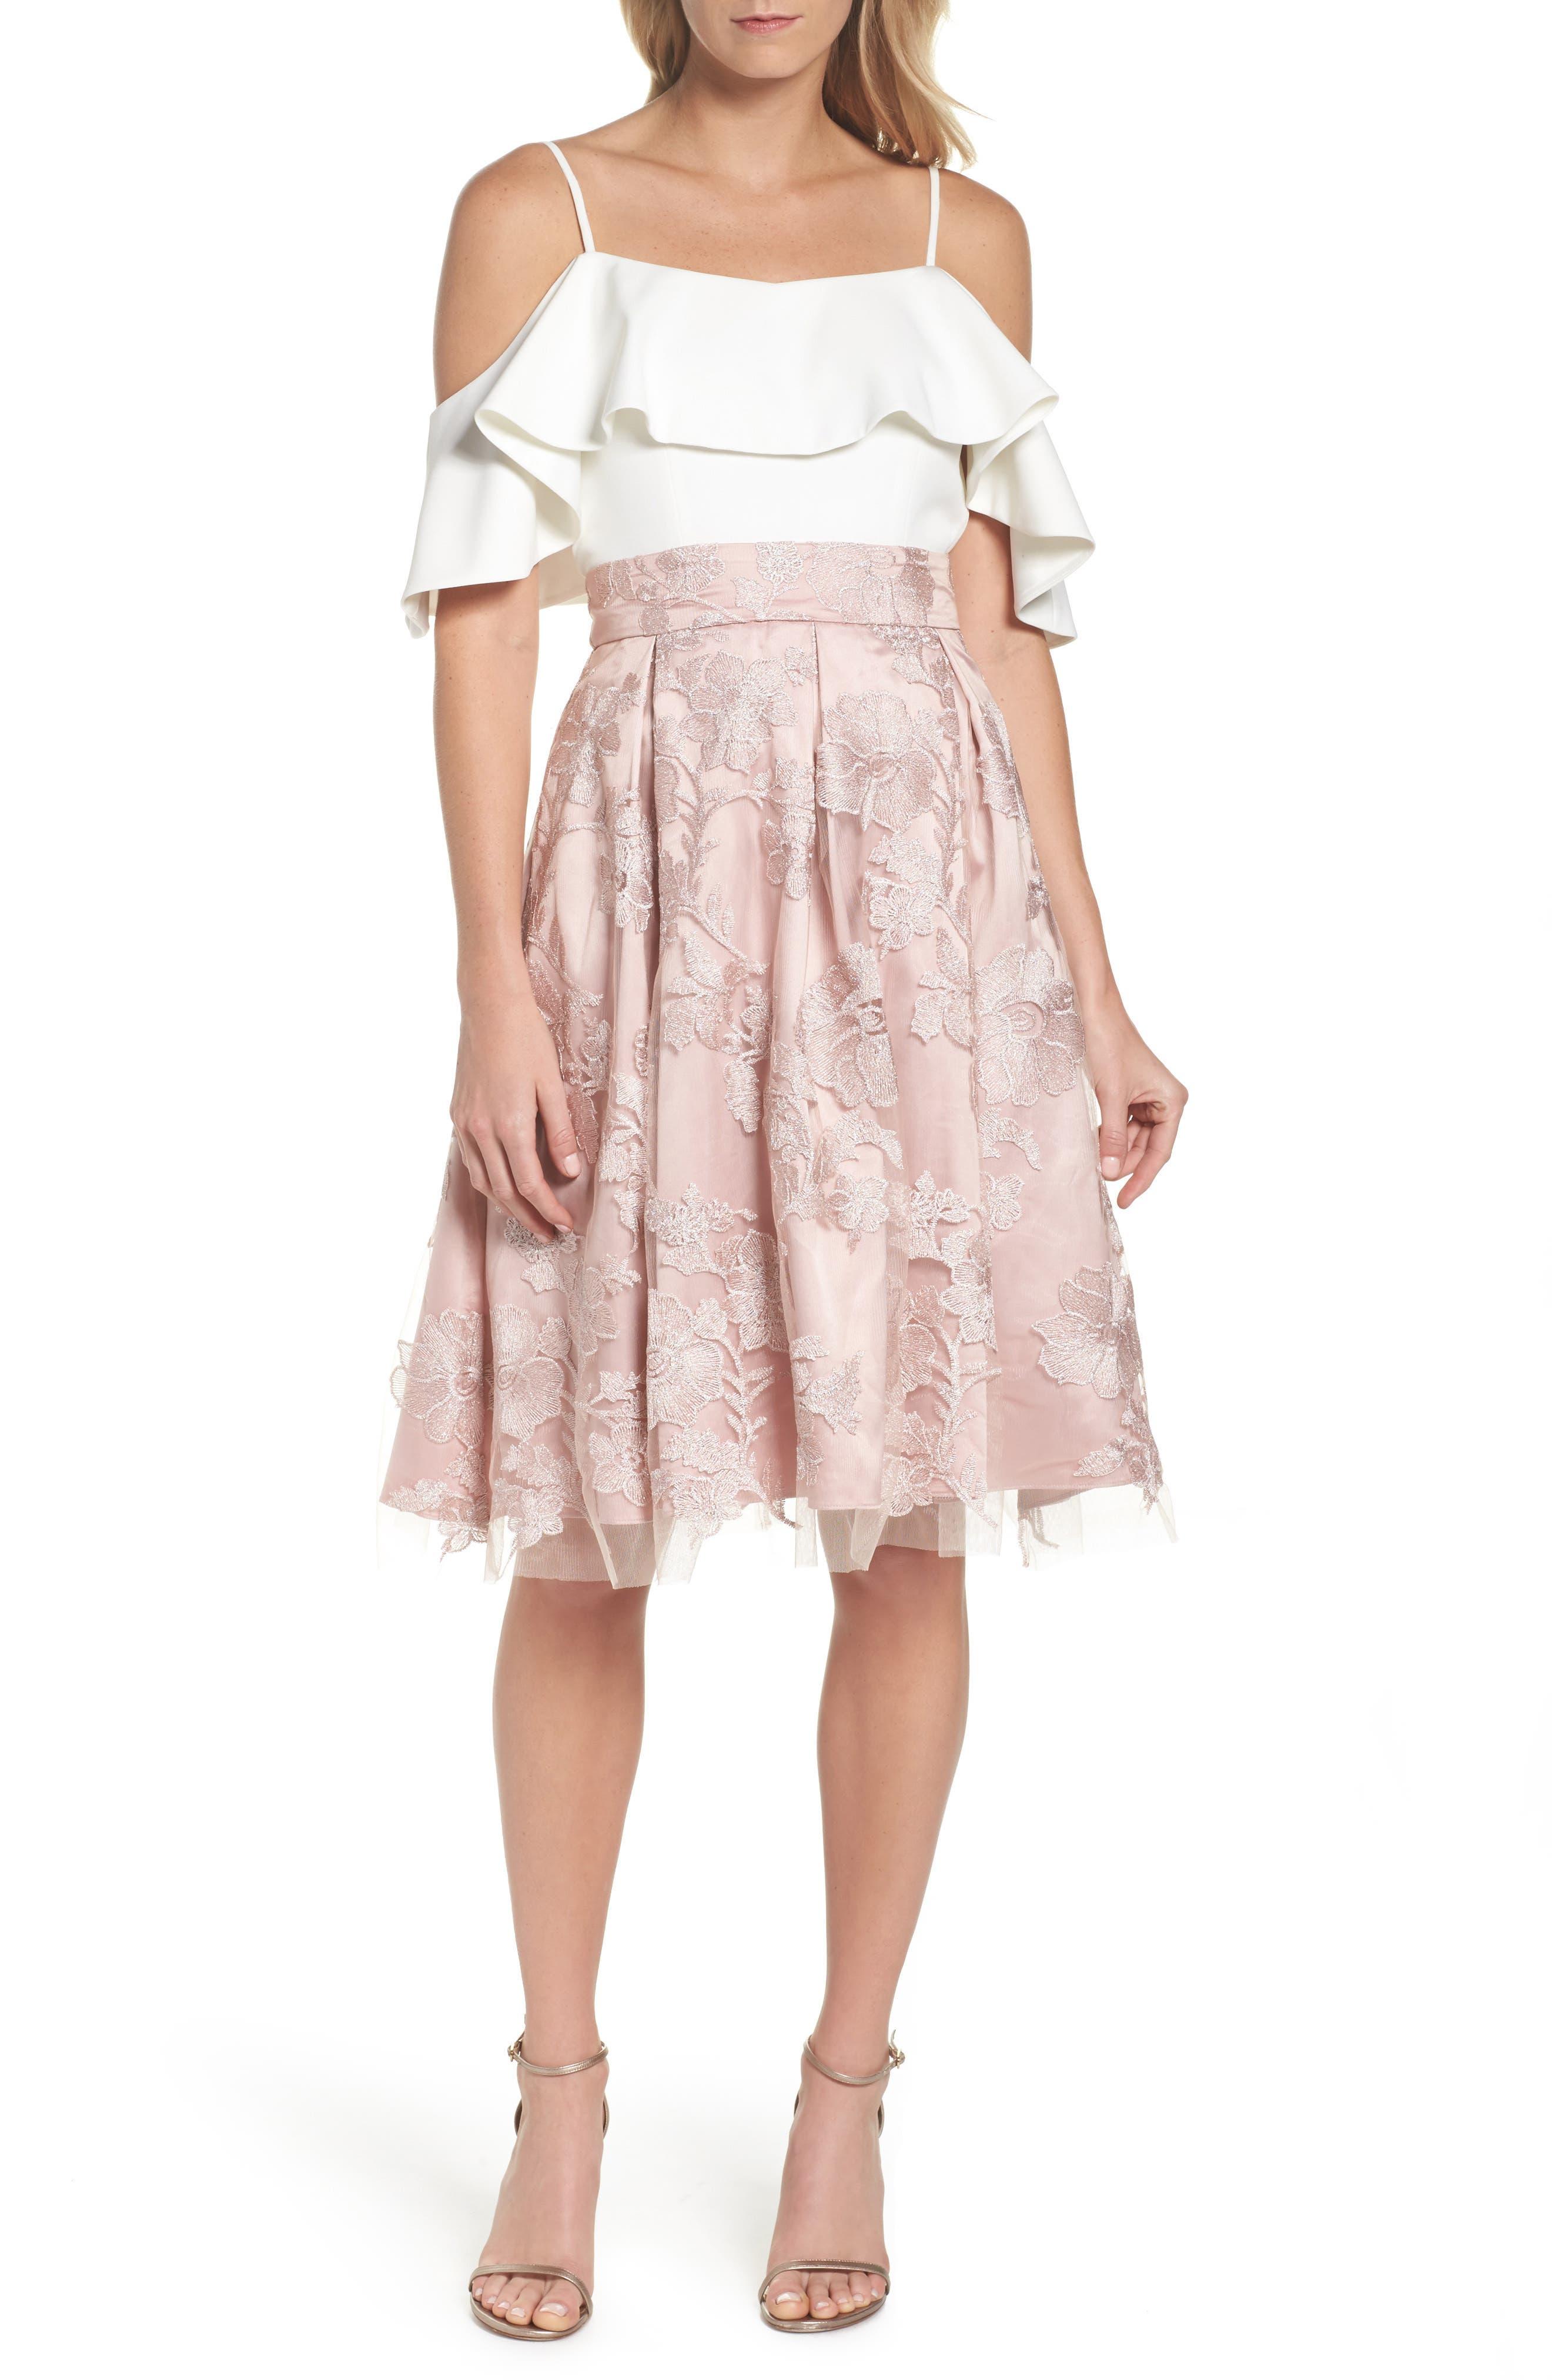 ELIZA J, Floral Embroidered Skirt, Alternate thumbnail 7, color, 254